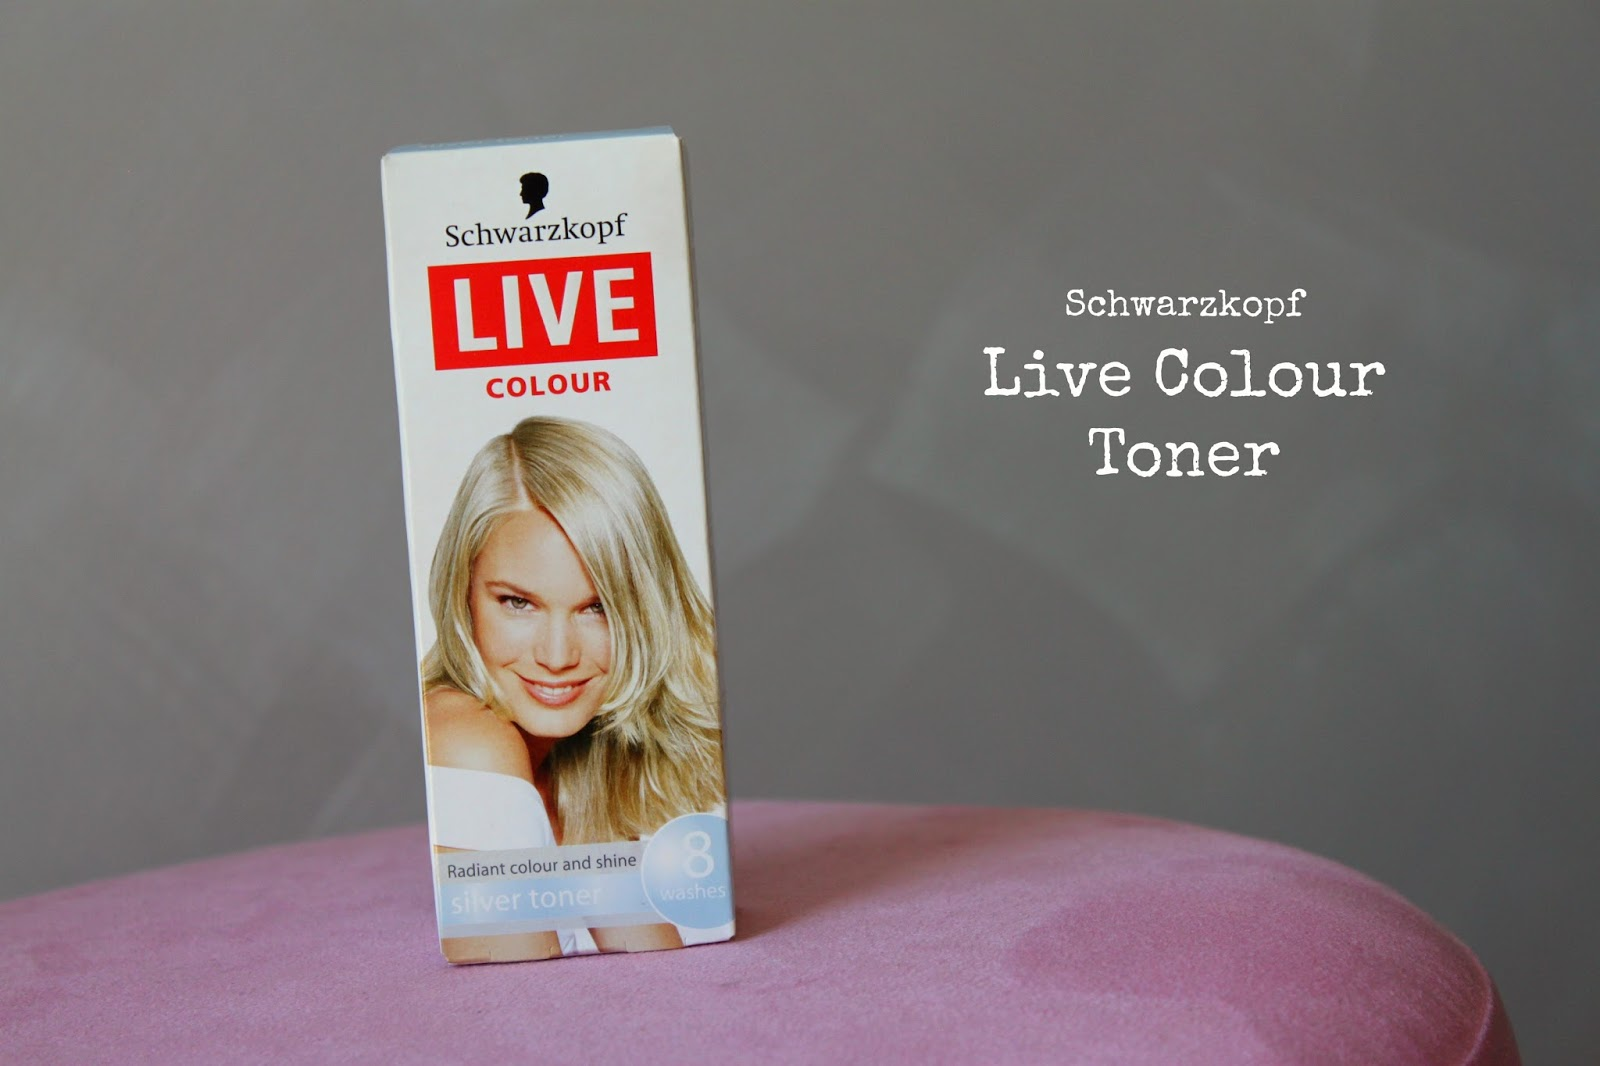 schwarzkopf live colour silver toner instructions